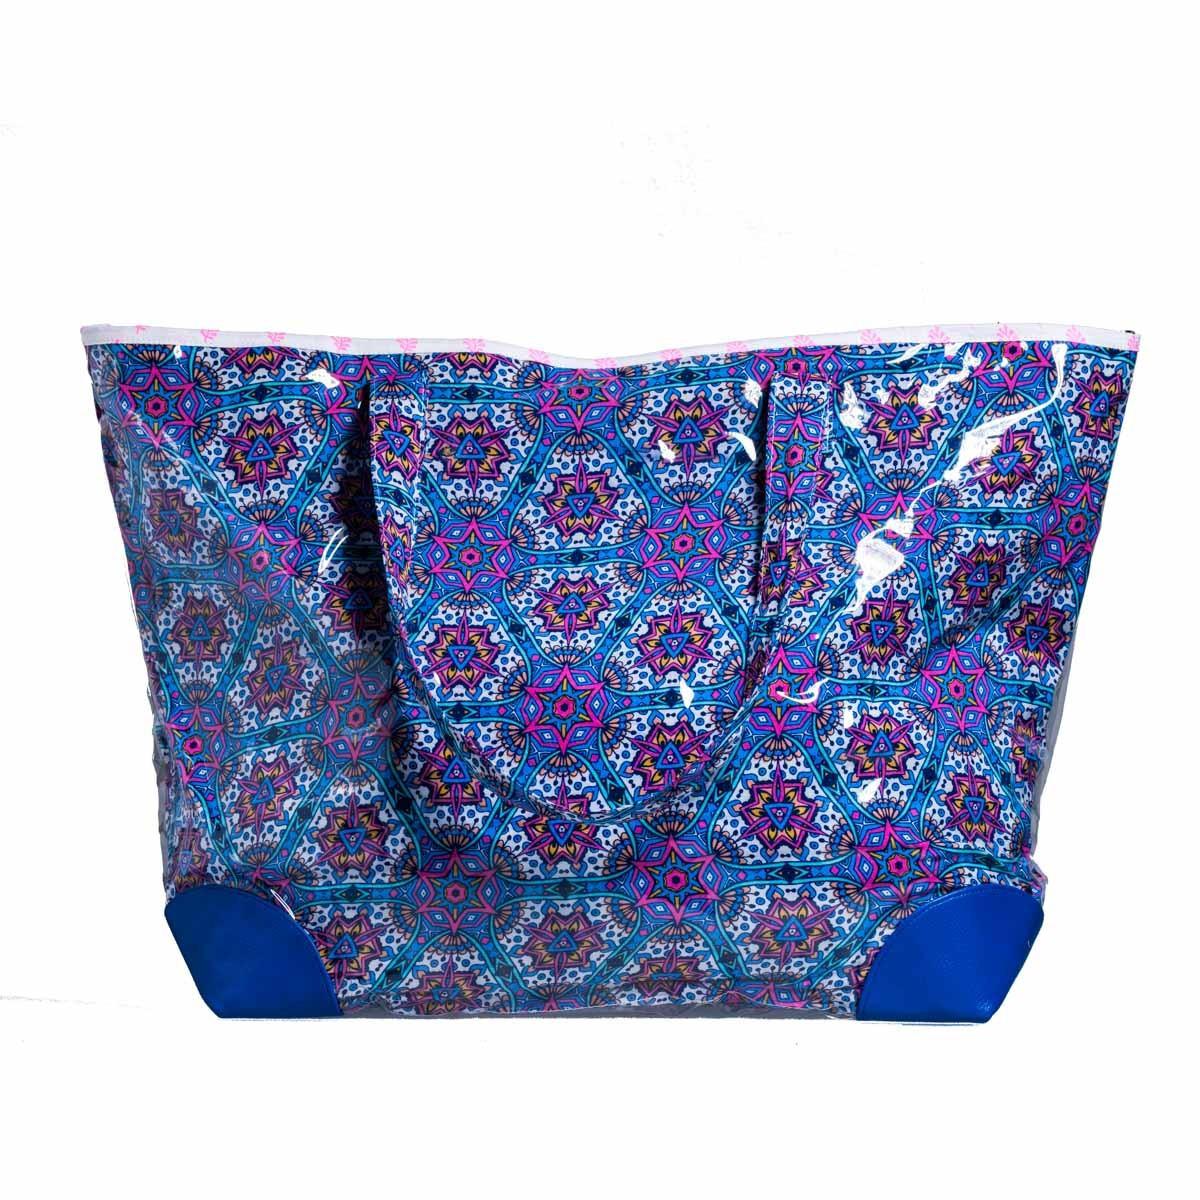 Grand sac cabas de plage bleu et violet